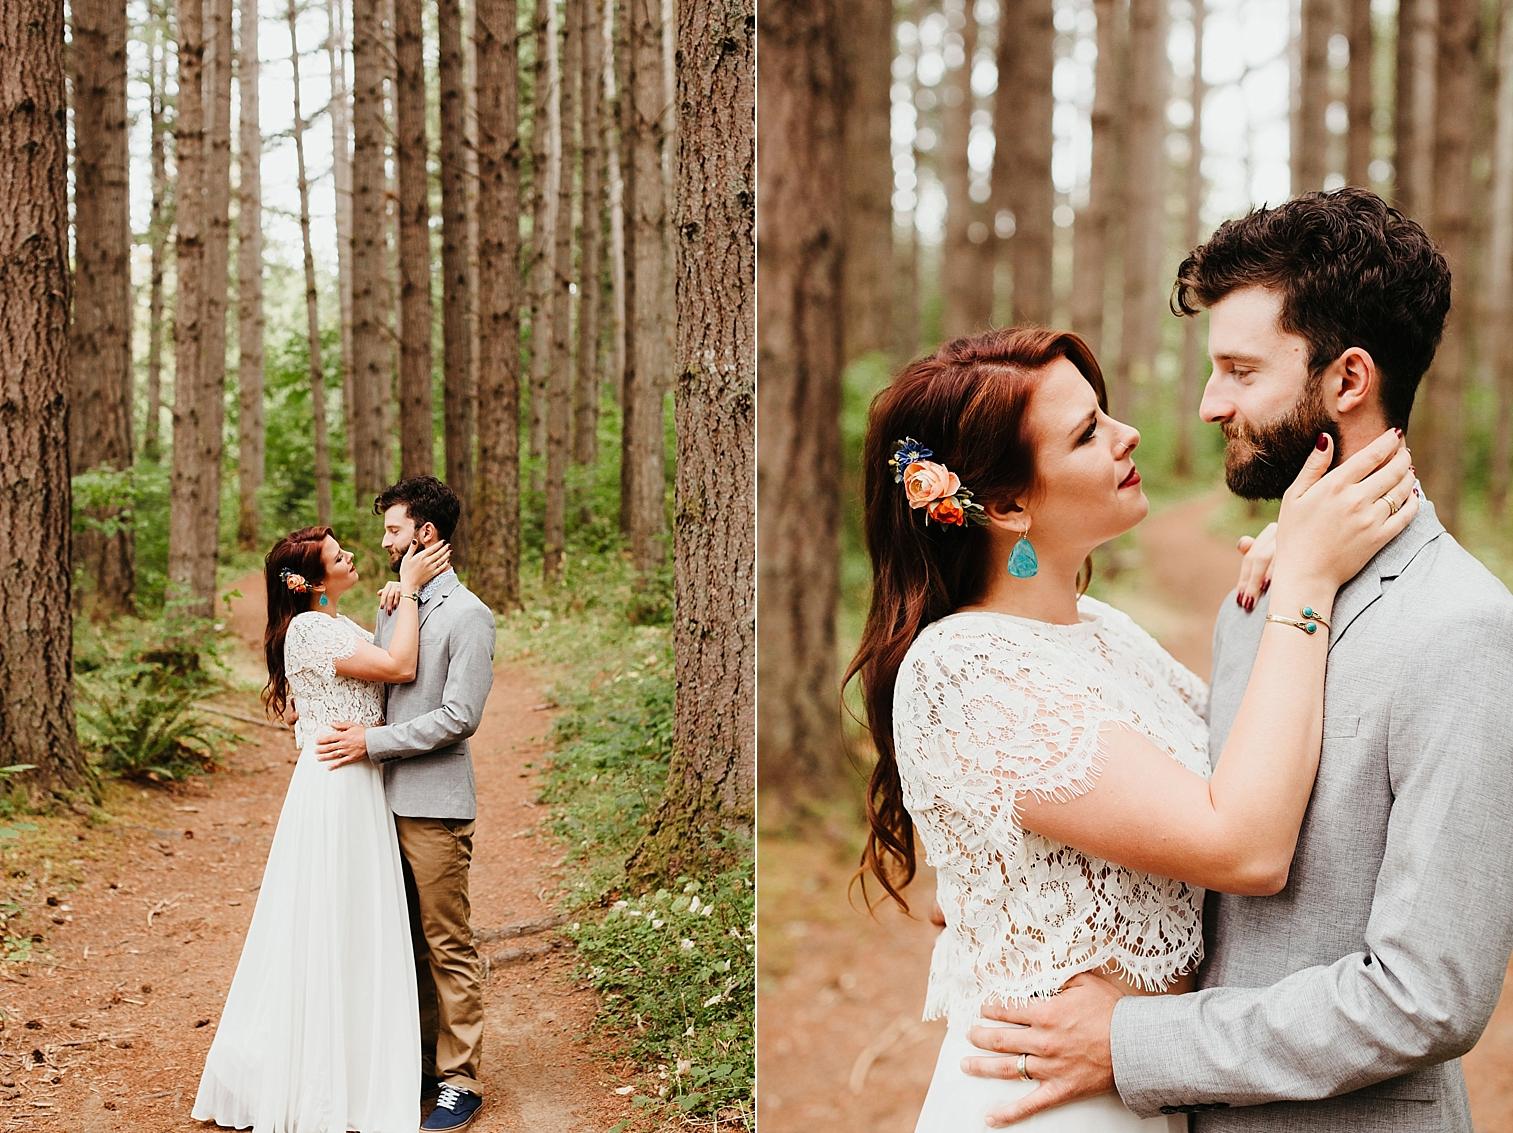 Summer-Camp-Themed-Wedding-38.jpg